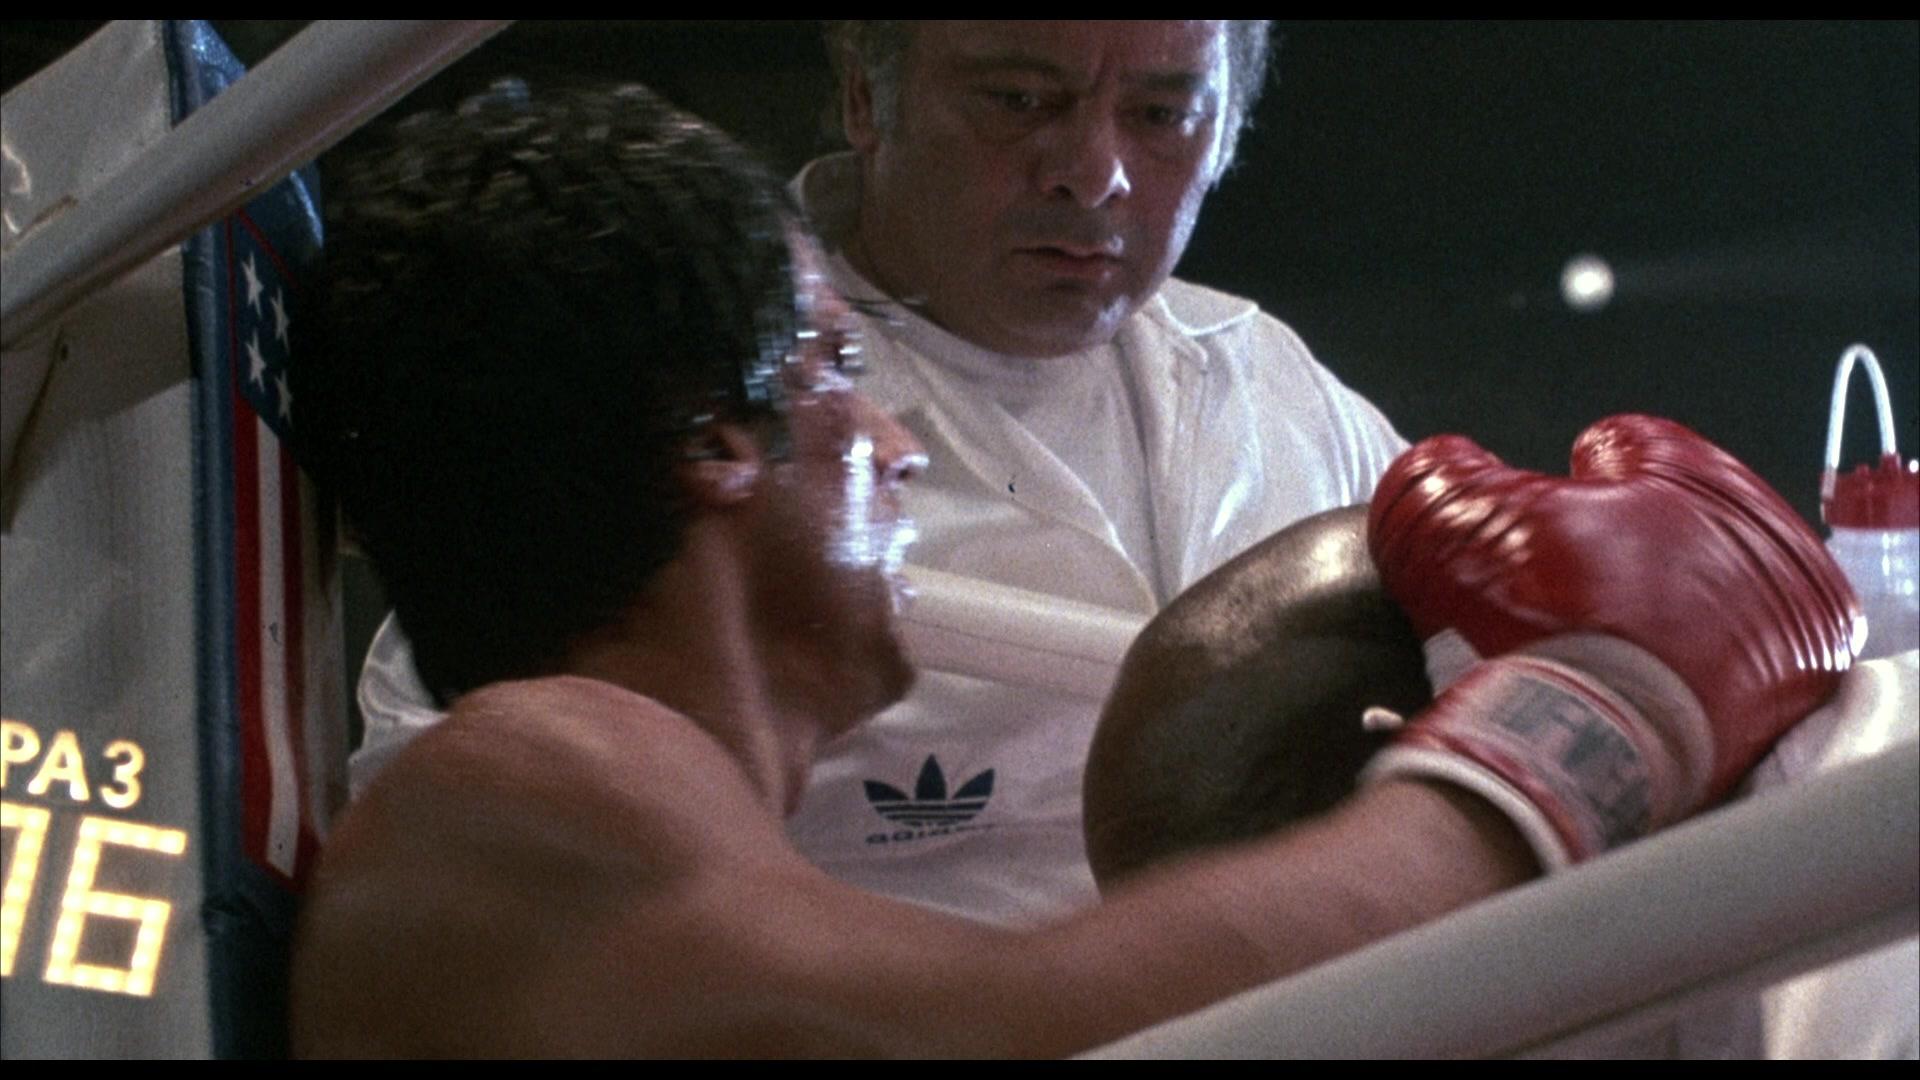 Adidas Shirt Worn By Burt Young (Paulie Pennino) In Rocky 4 (1985)